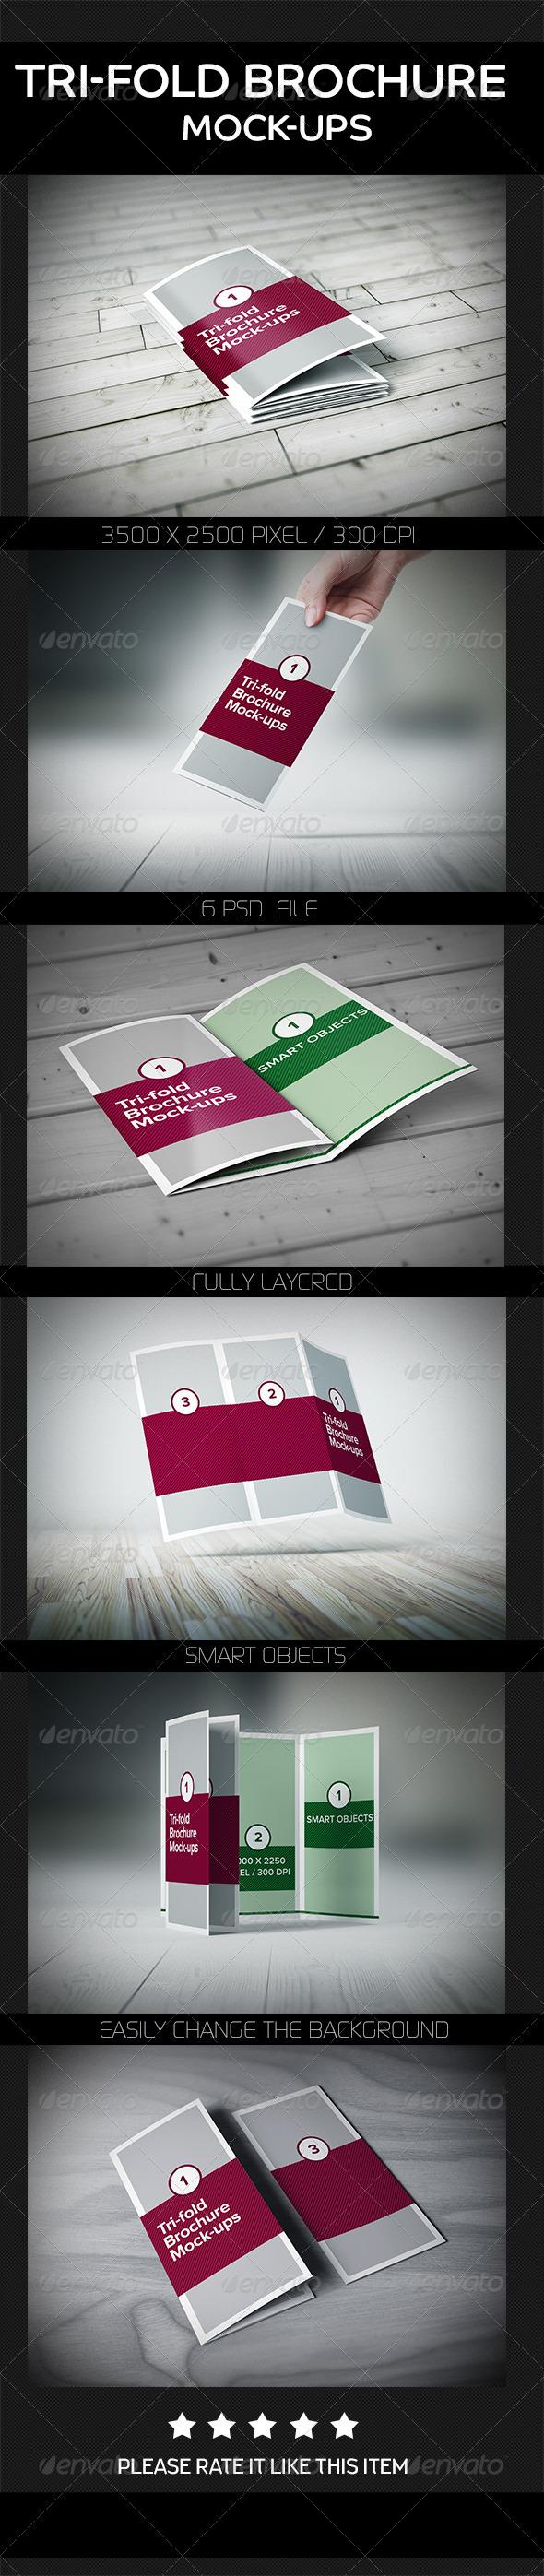 GraphicRiver Tri-Fold Brochure Mock-Ups 8123470